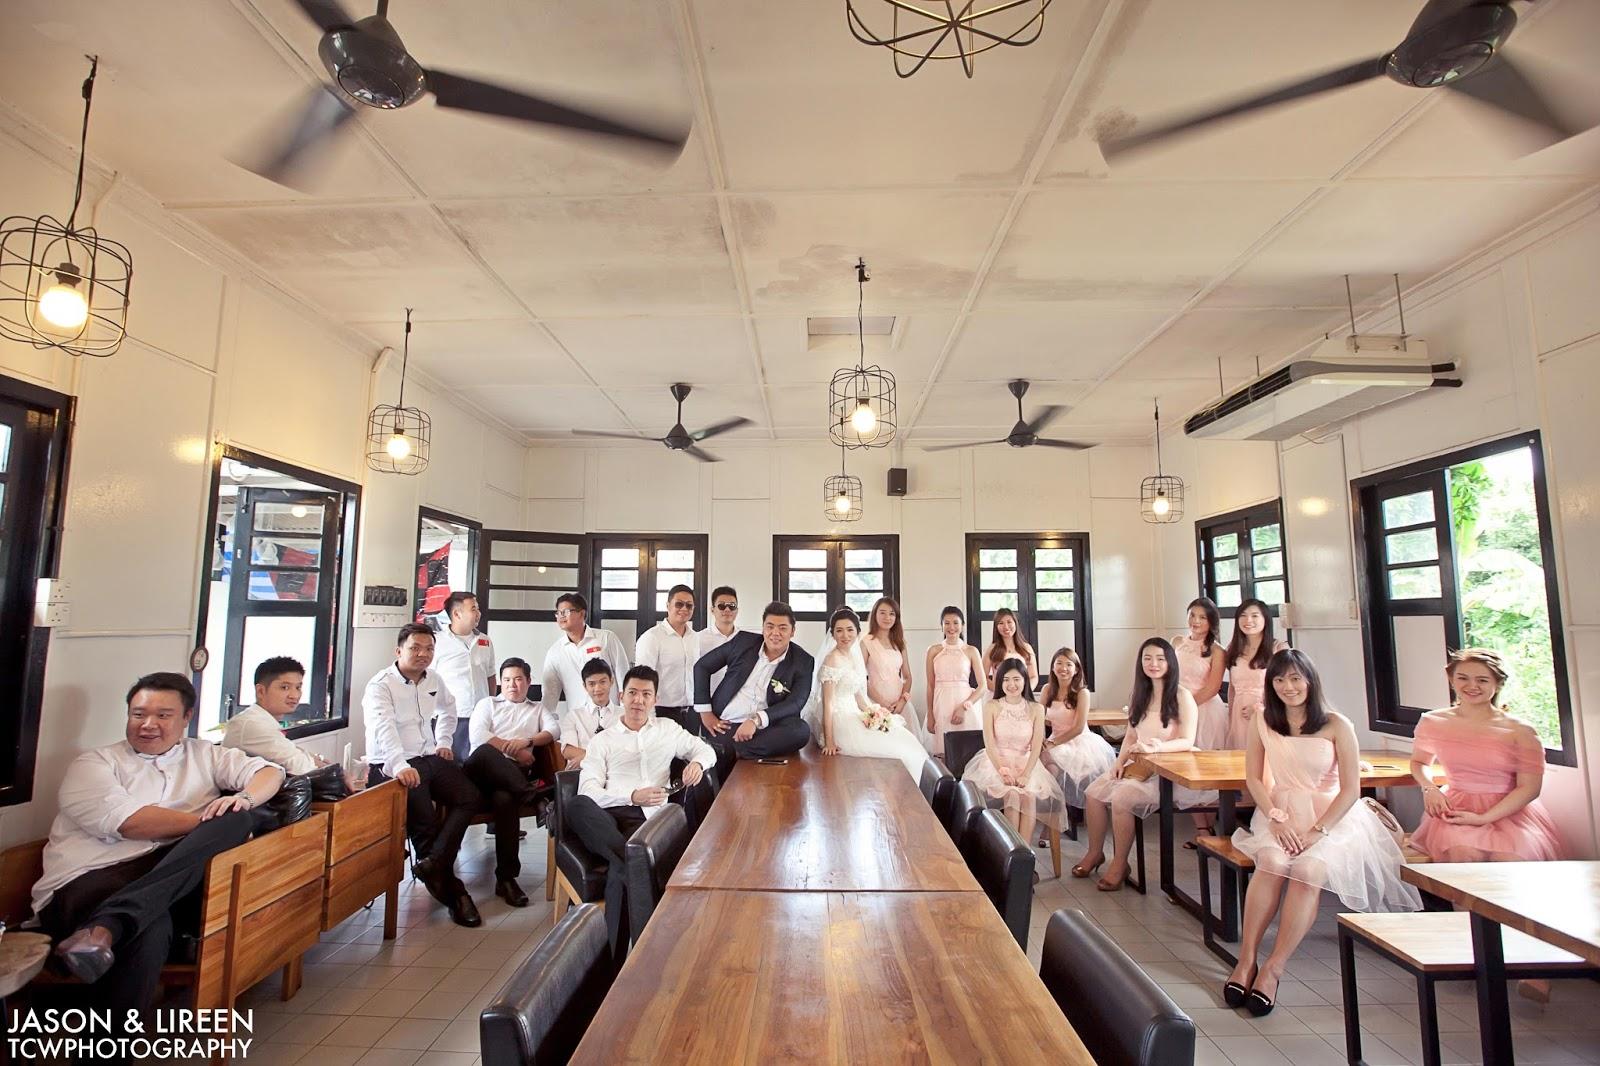 Awd muar jason lireen tcwphotography venue lotta cafe muar johore malaysia junglespirit Gallery